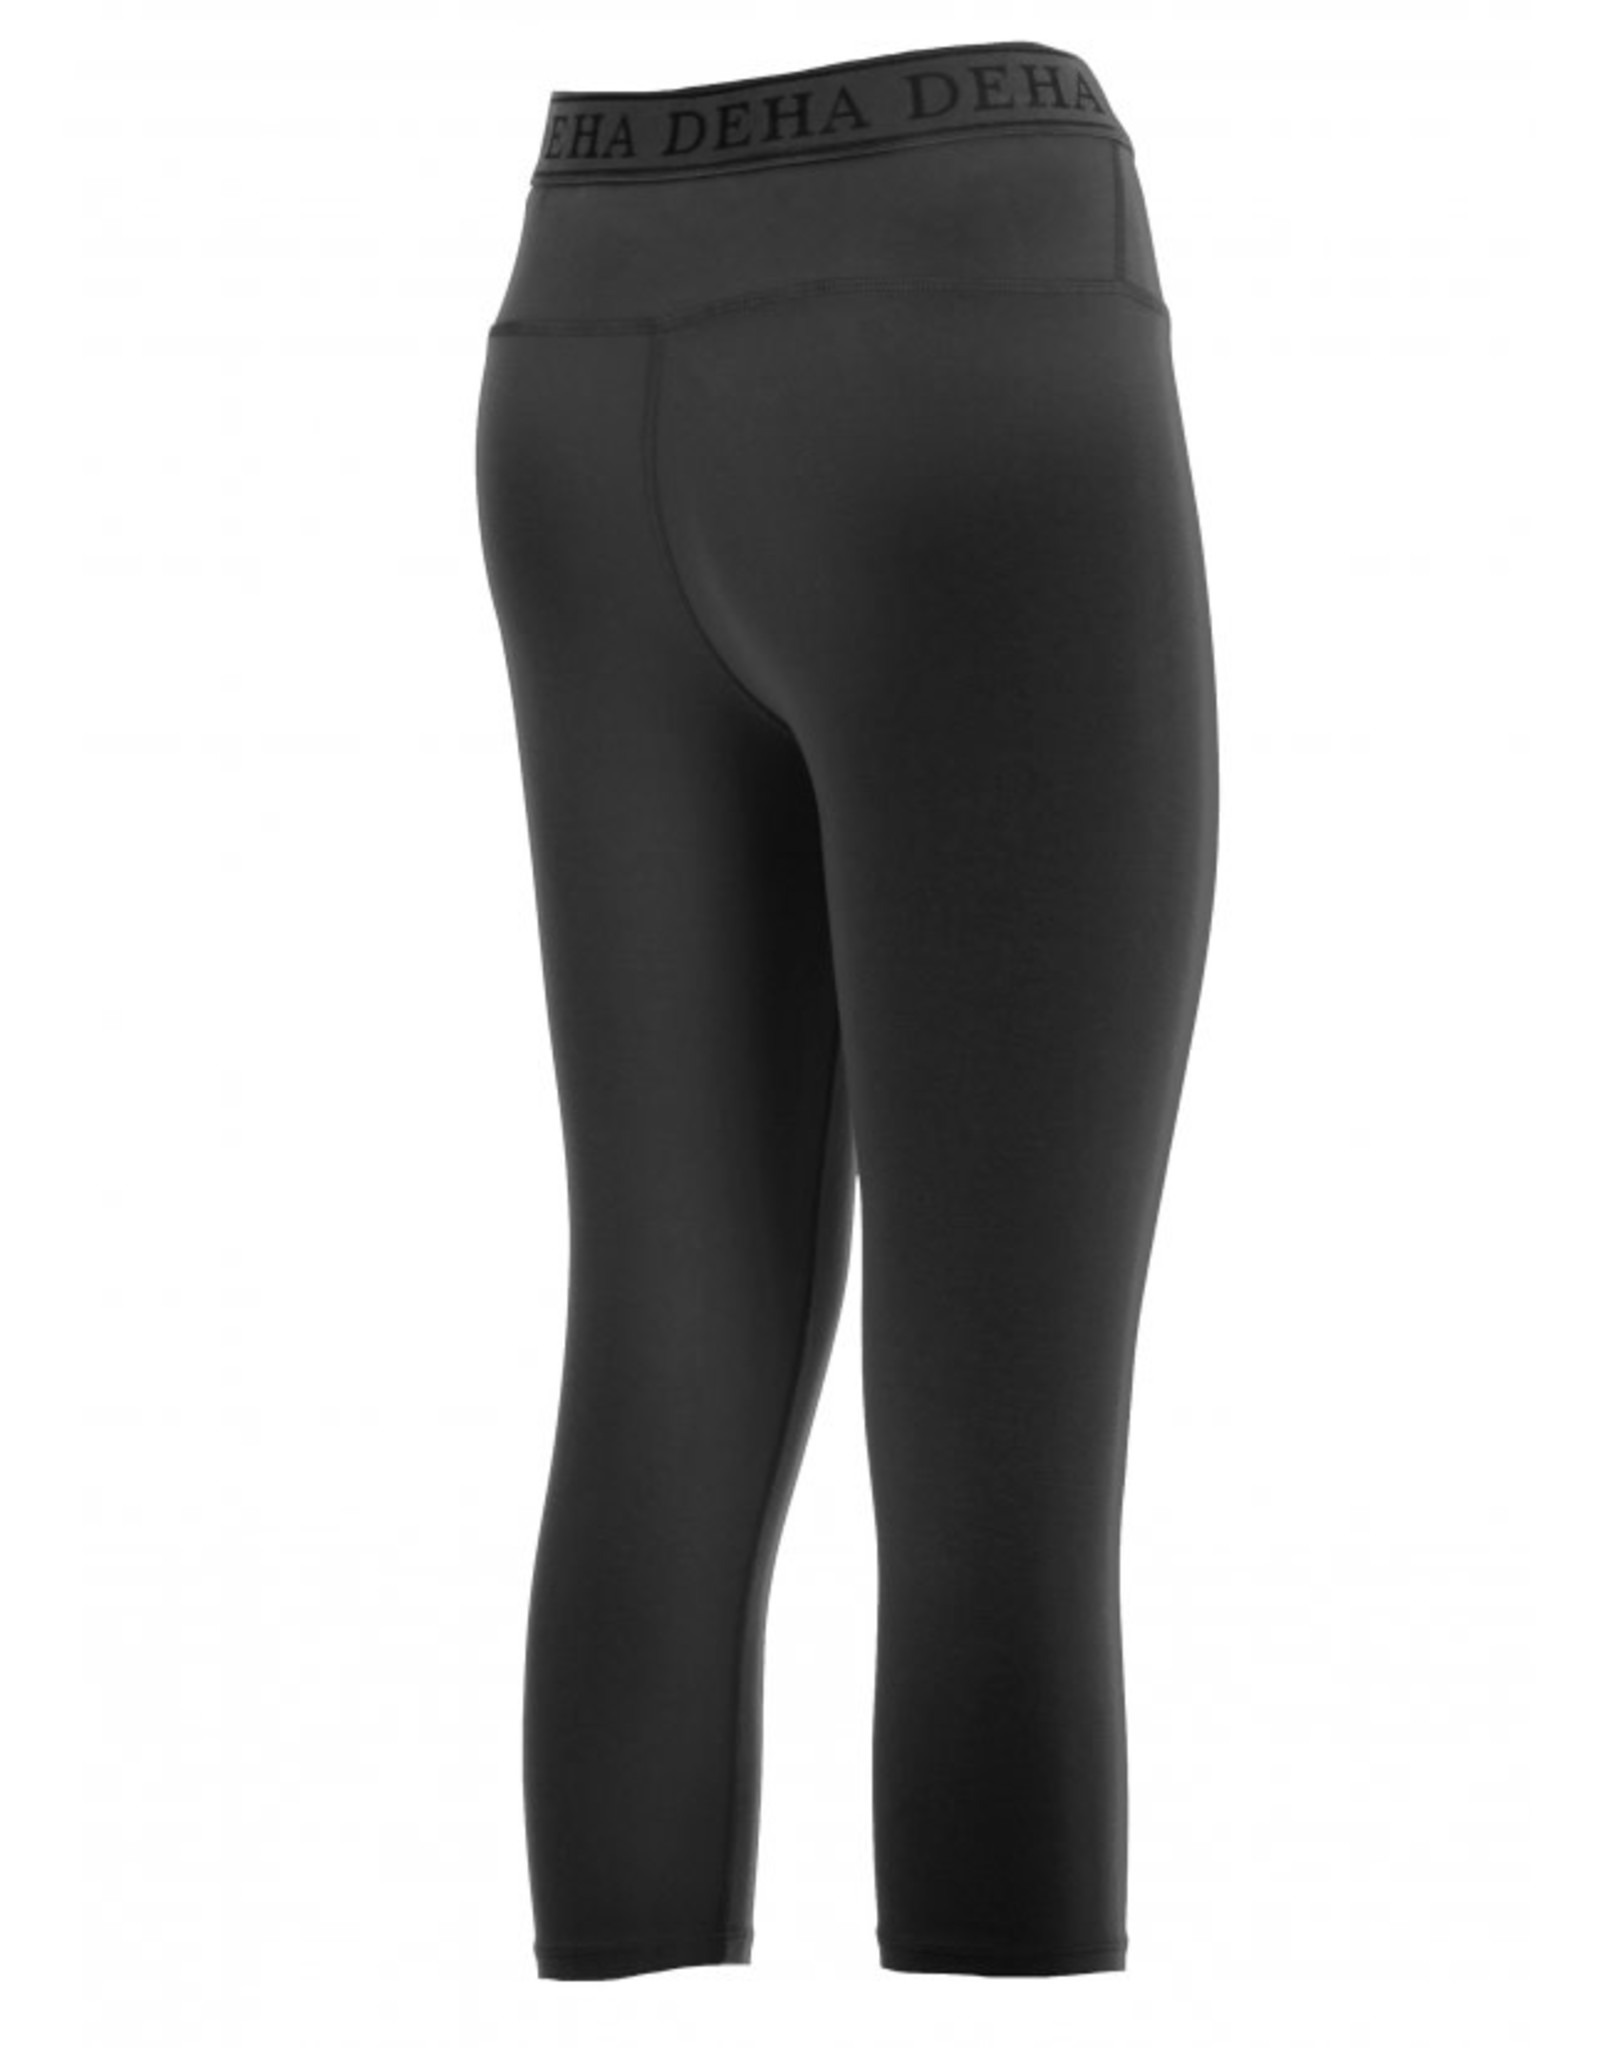 Deha B94706 3/4 legging